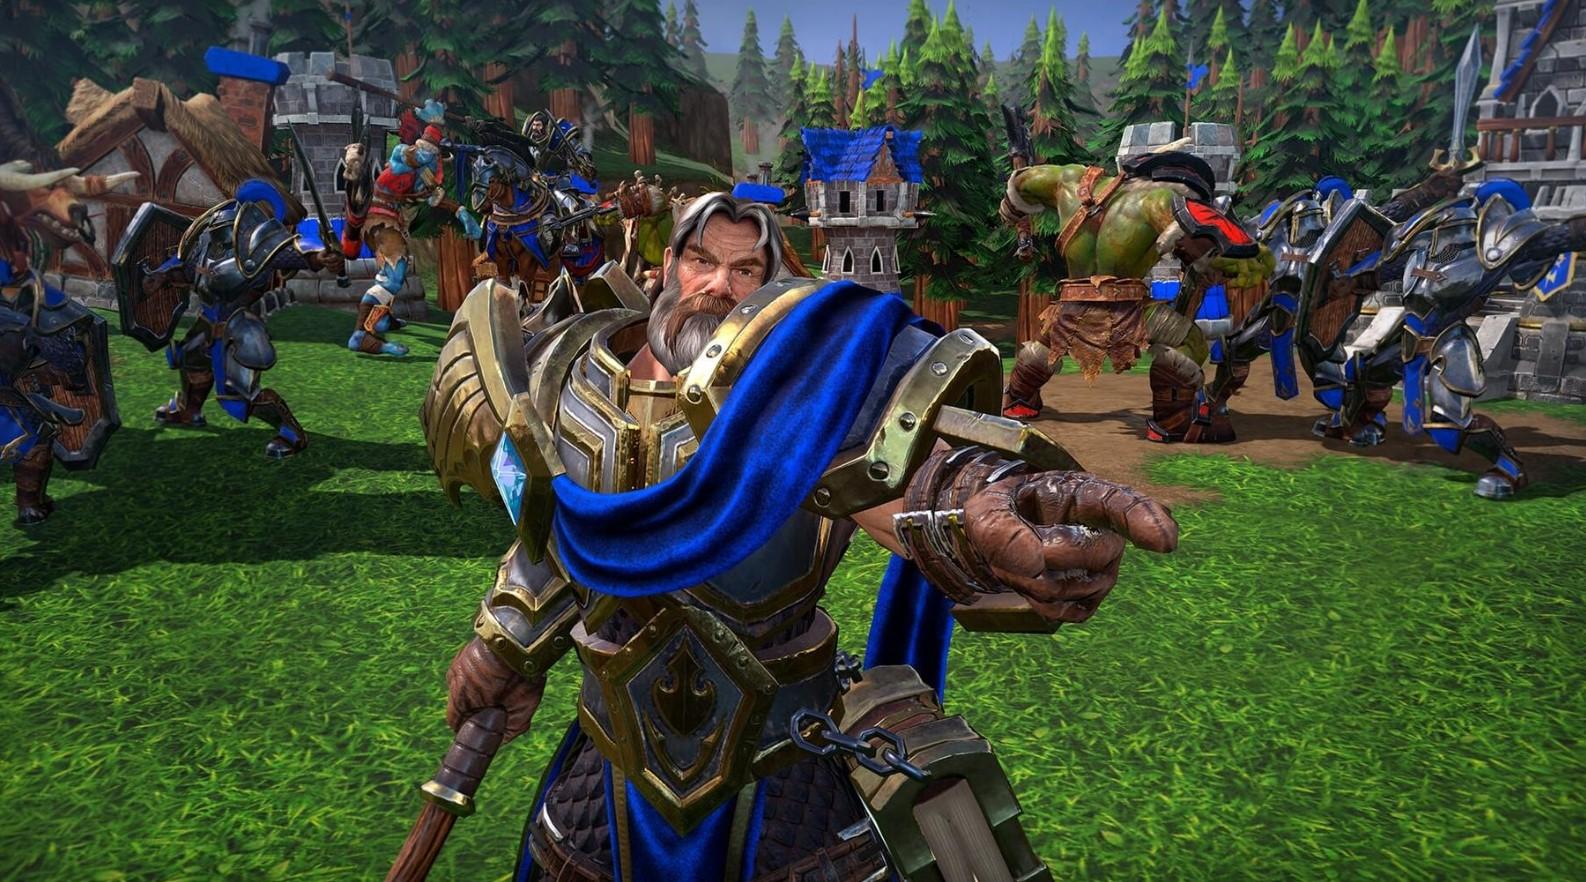 Подрядчики Blizzard рассказали оработе над Warcraft III: Reforged. Там много негатива